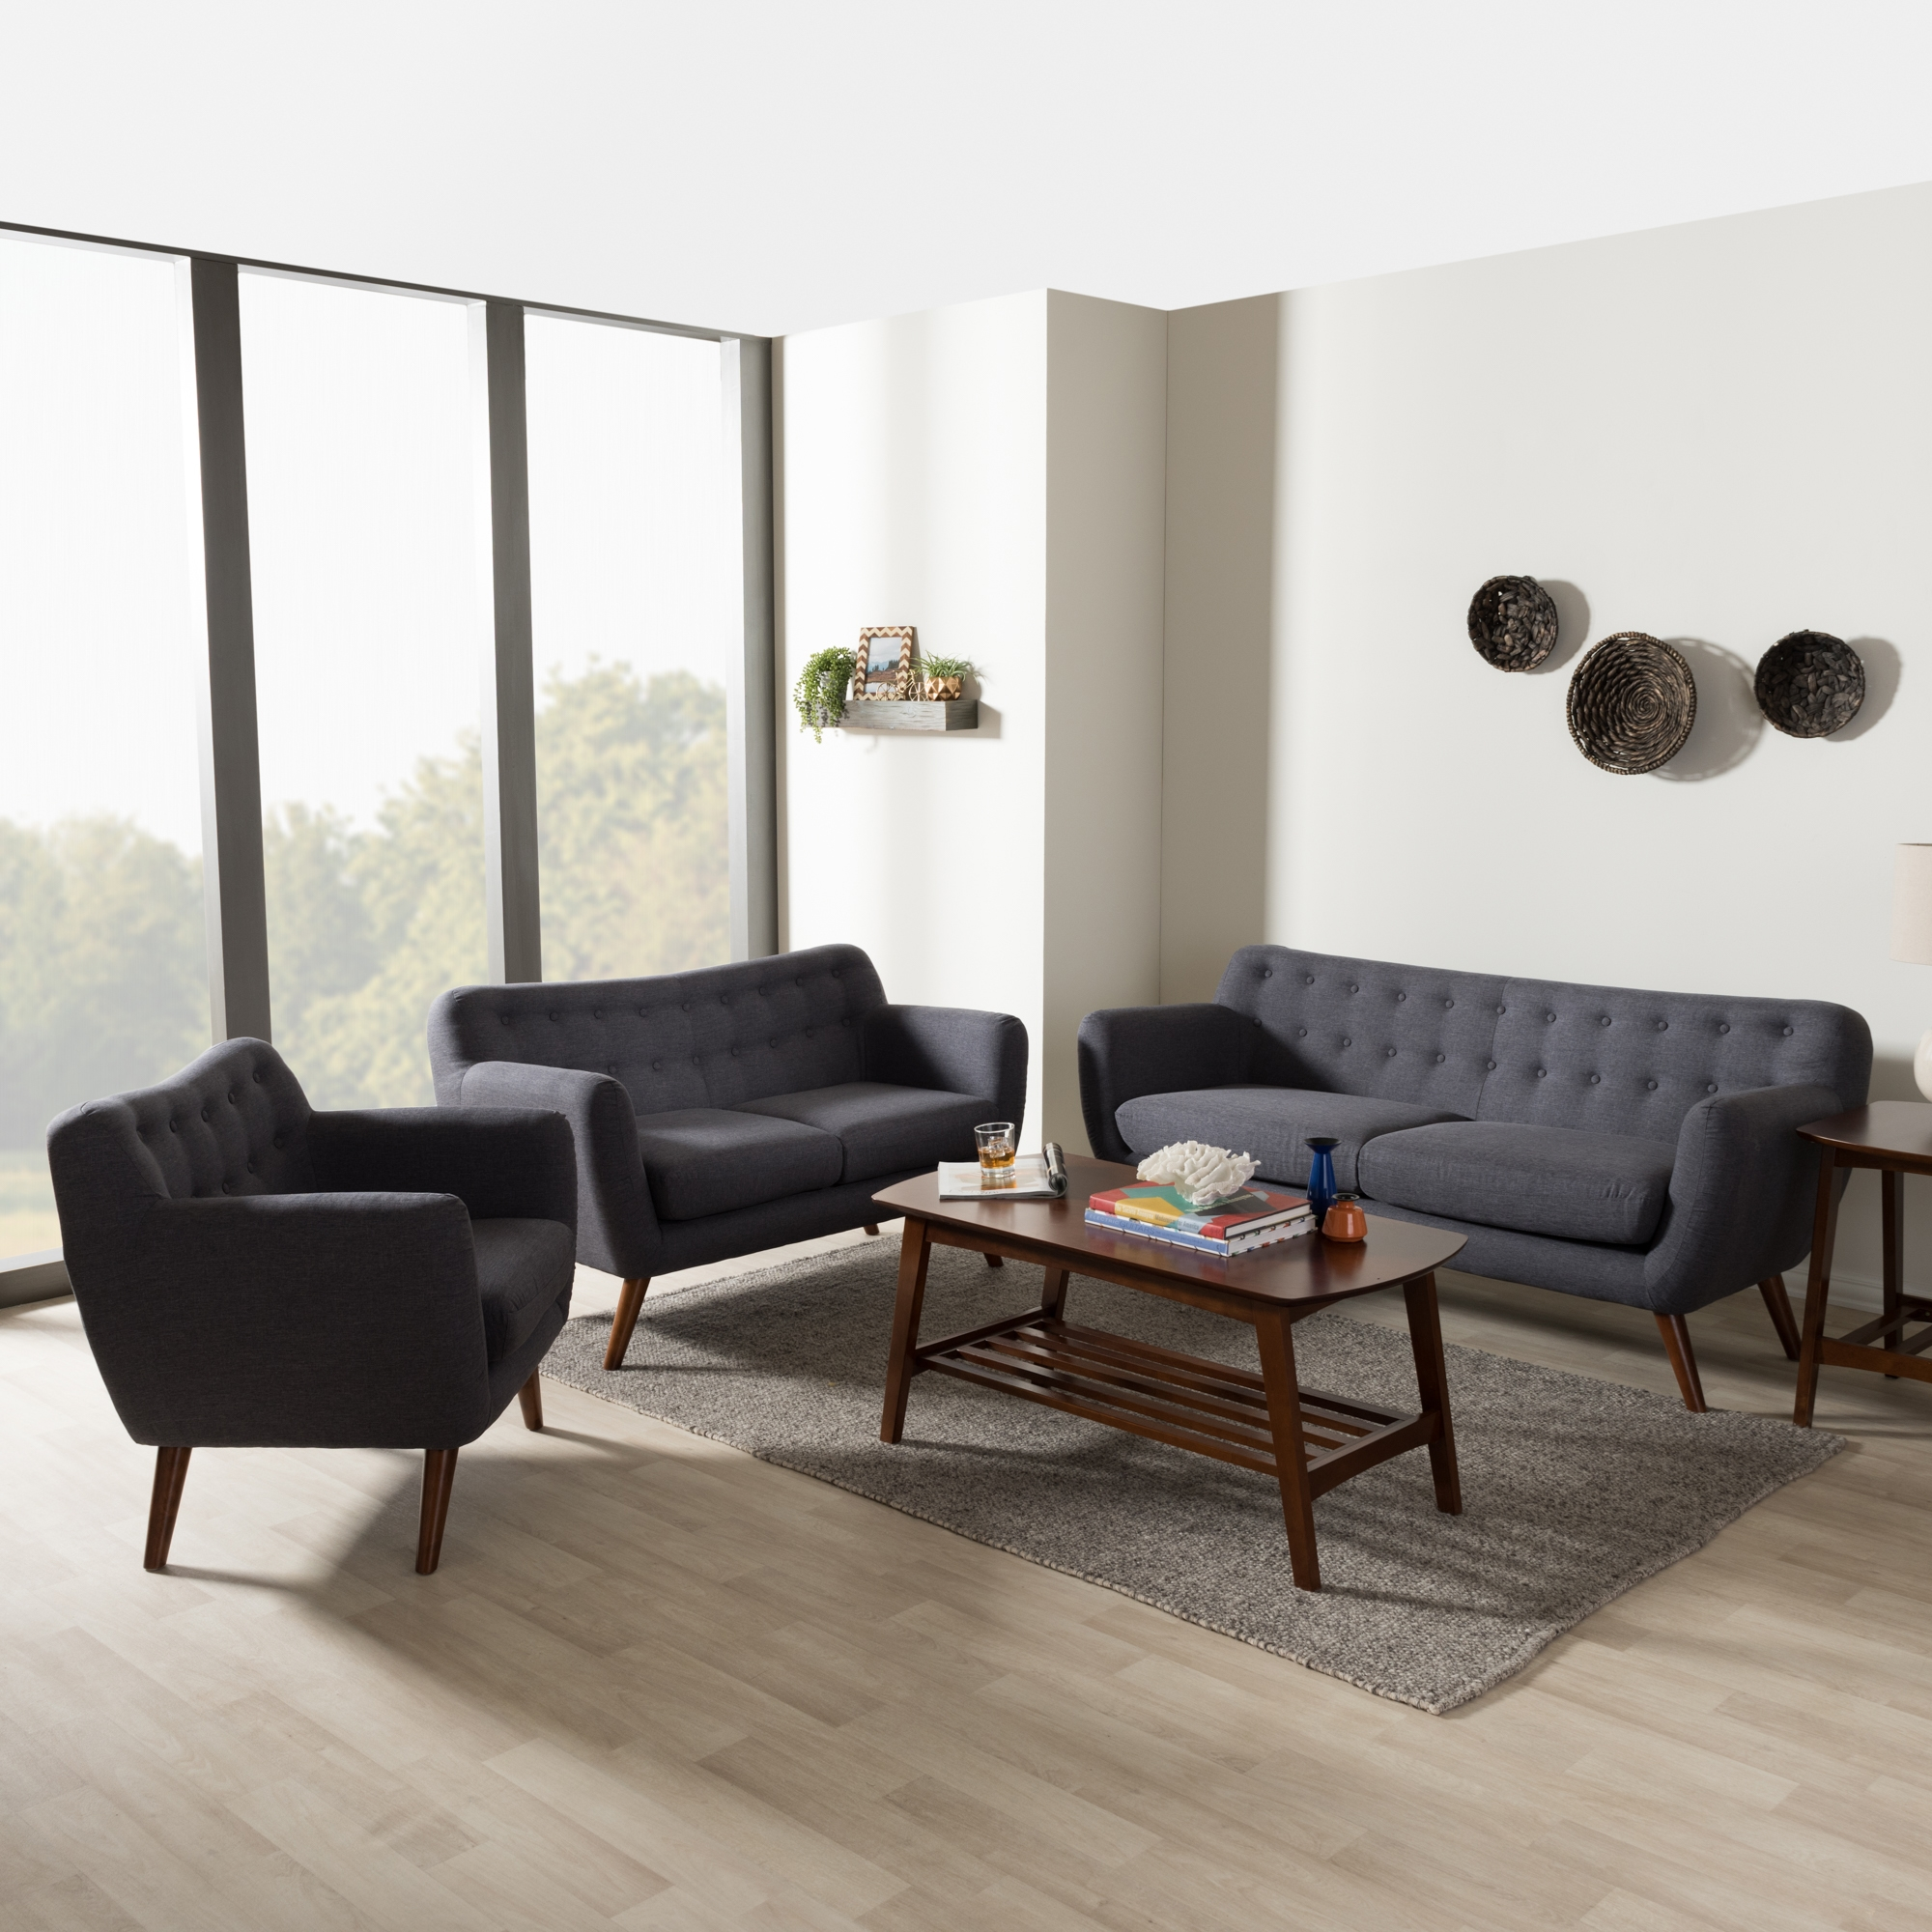 Baxton Studio Harper Mid Century Modern Dark Grey Fabric Upholstered Walnut  Wood Button Tufted 3 Piece Sofa Set